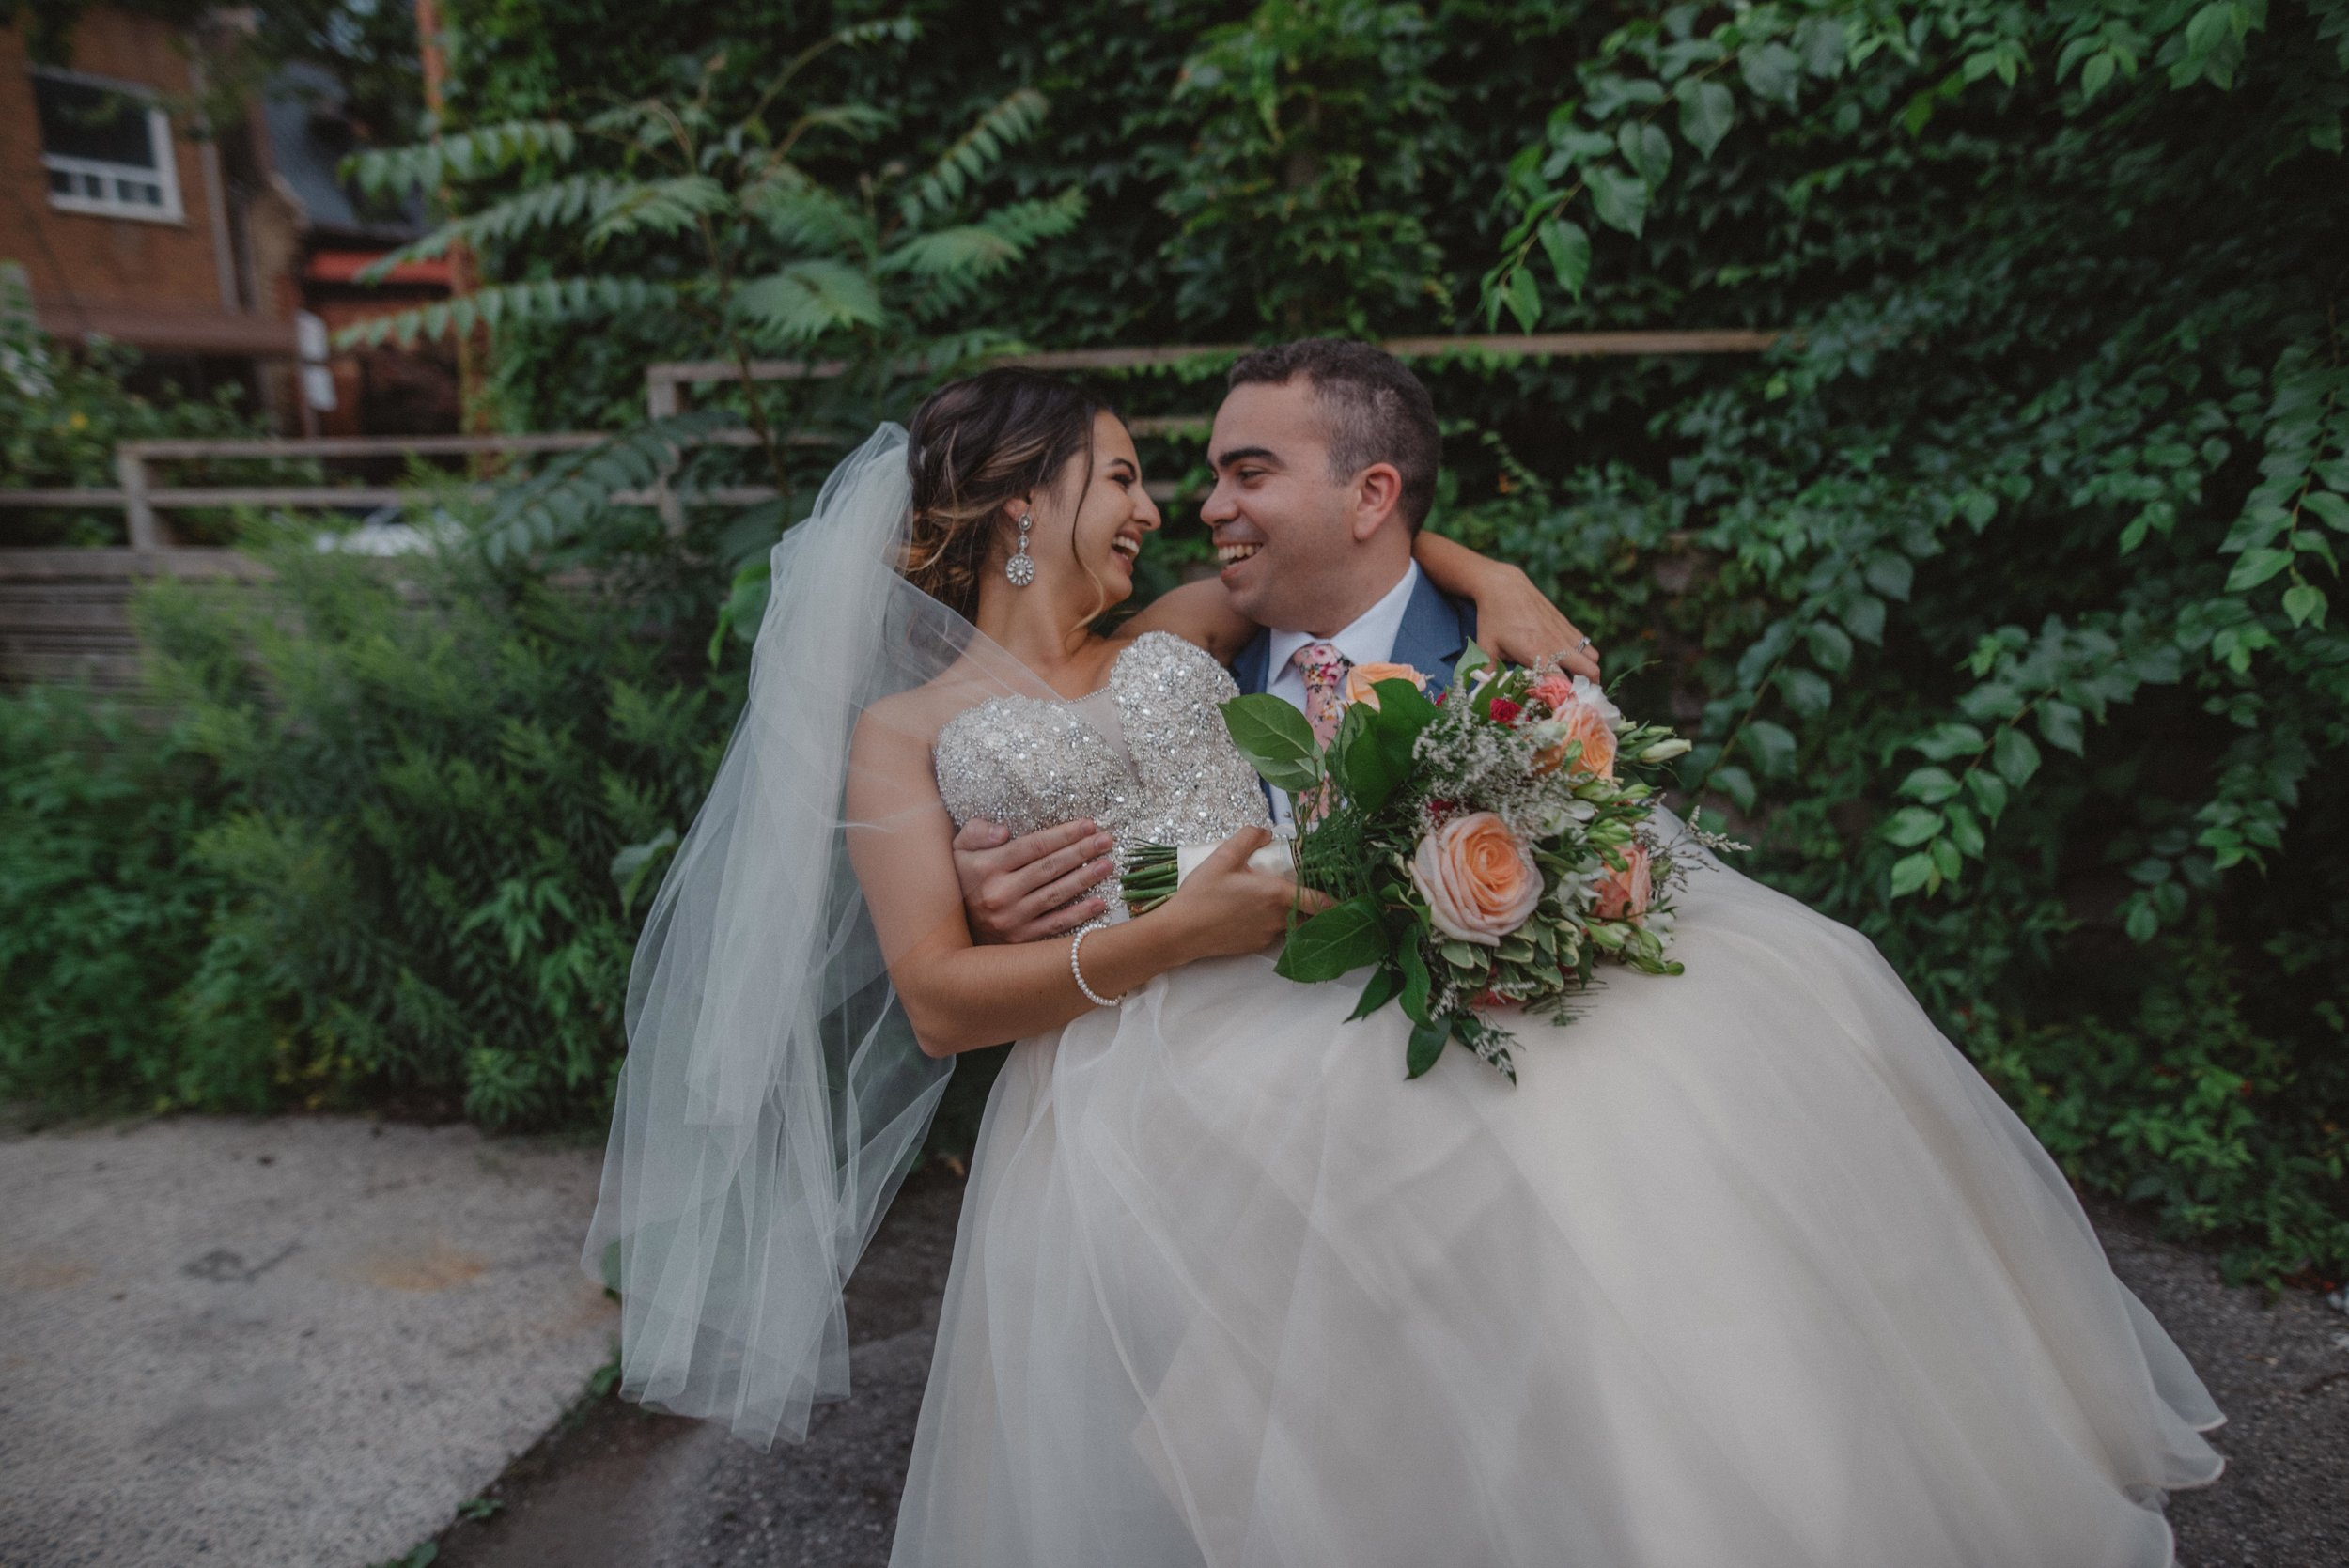 mariage_photographe_toronto_gatineau_ottawa_photographer_wedding-16.jpg